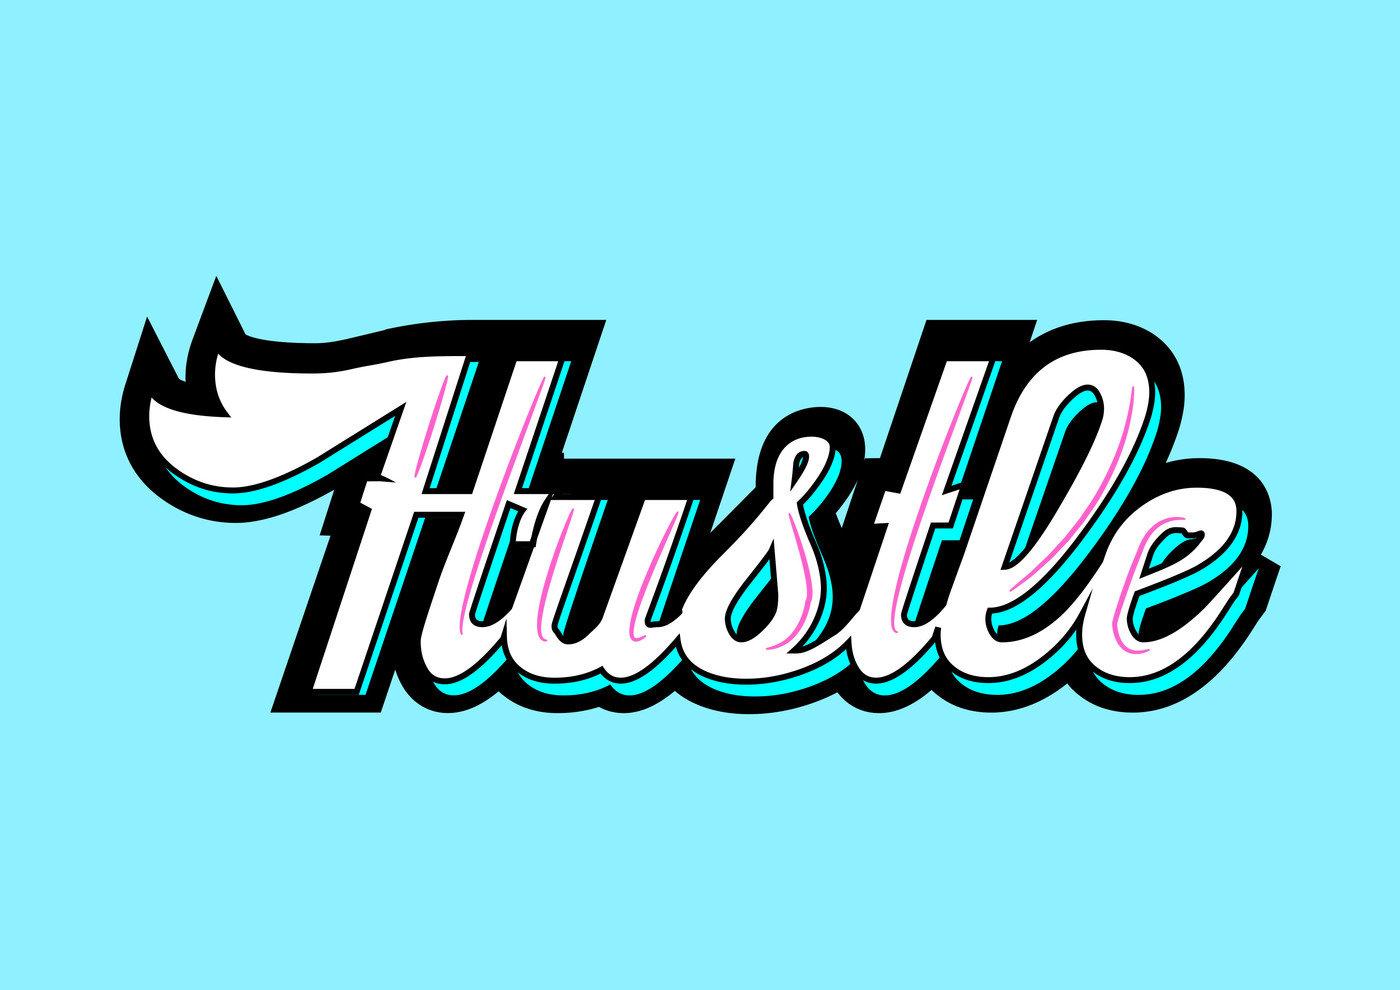 Hustle Word Art Logo by Joel Jose at Coroflot.com.